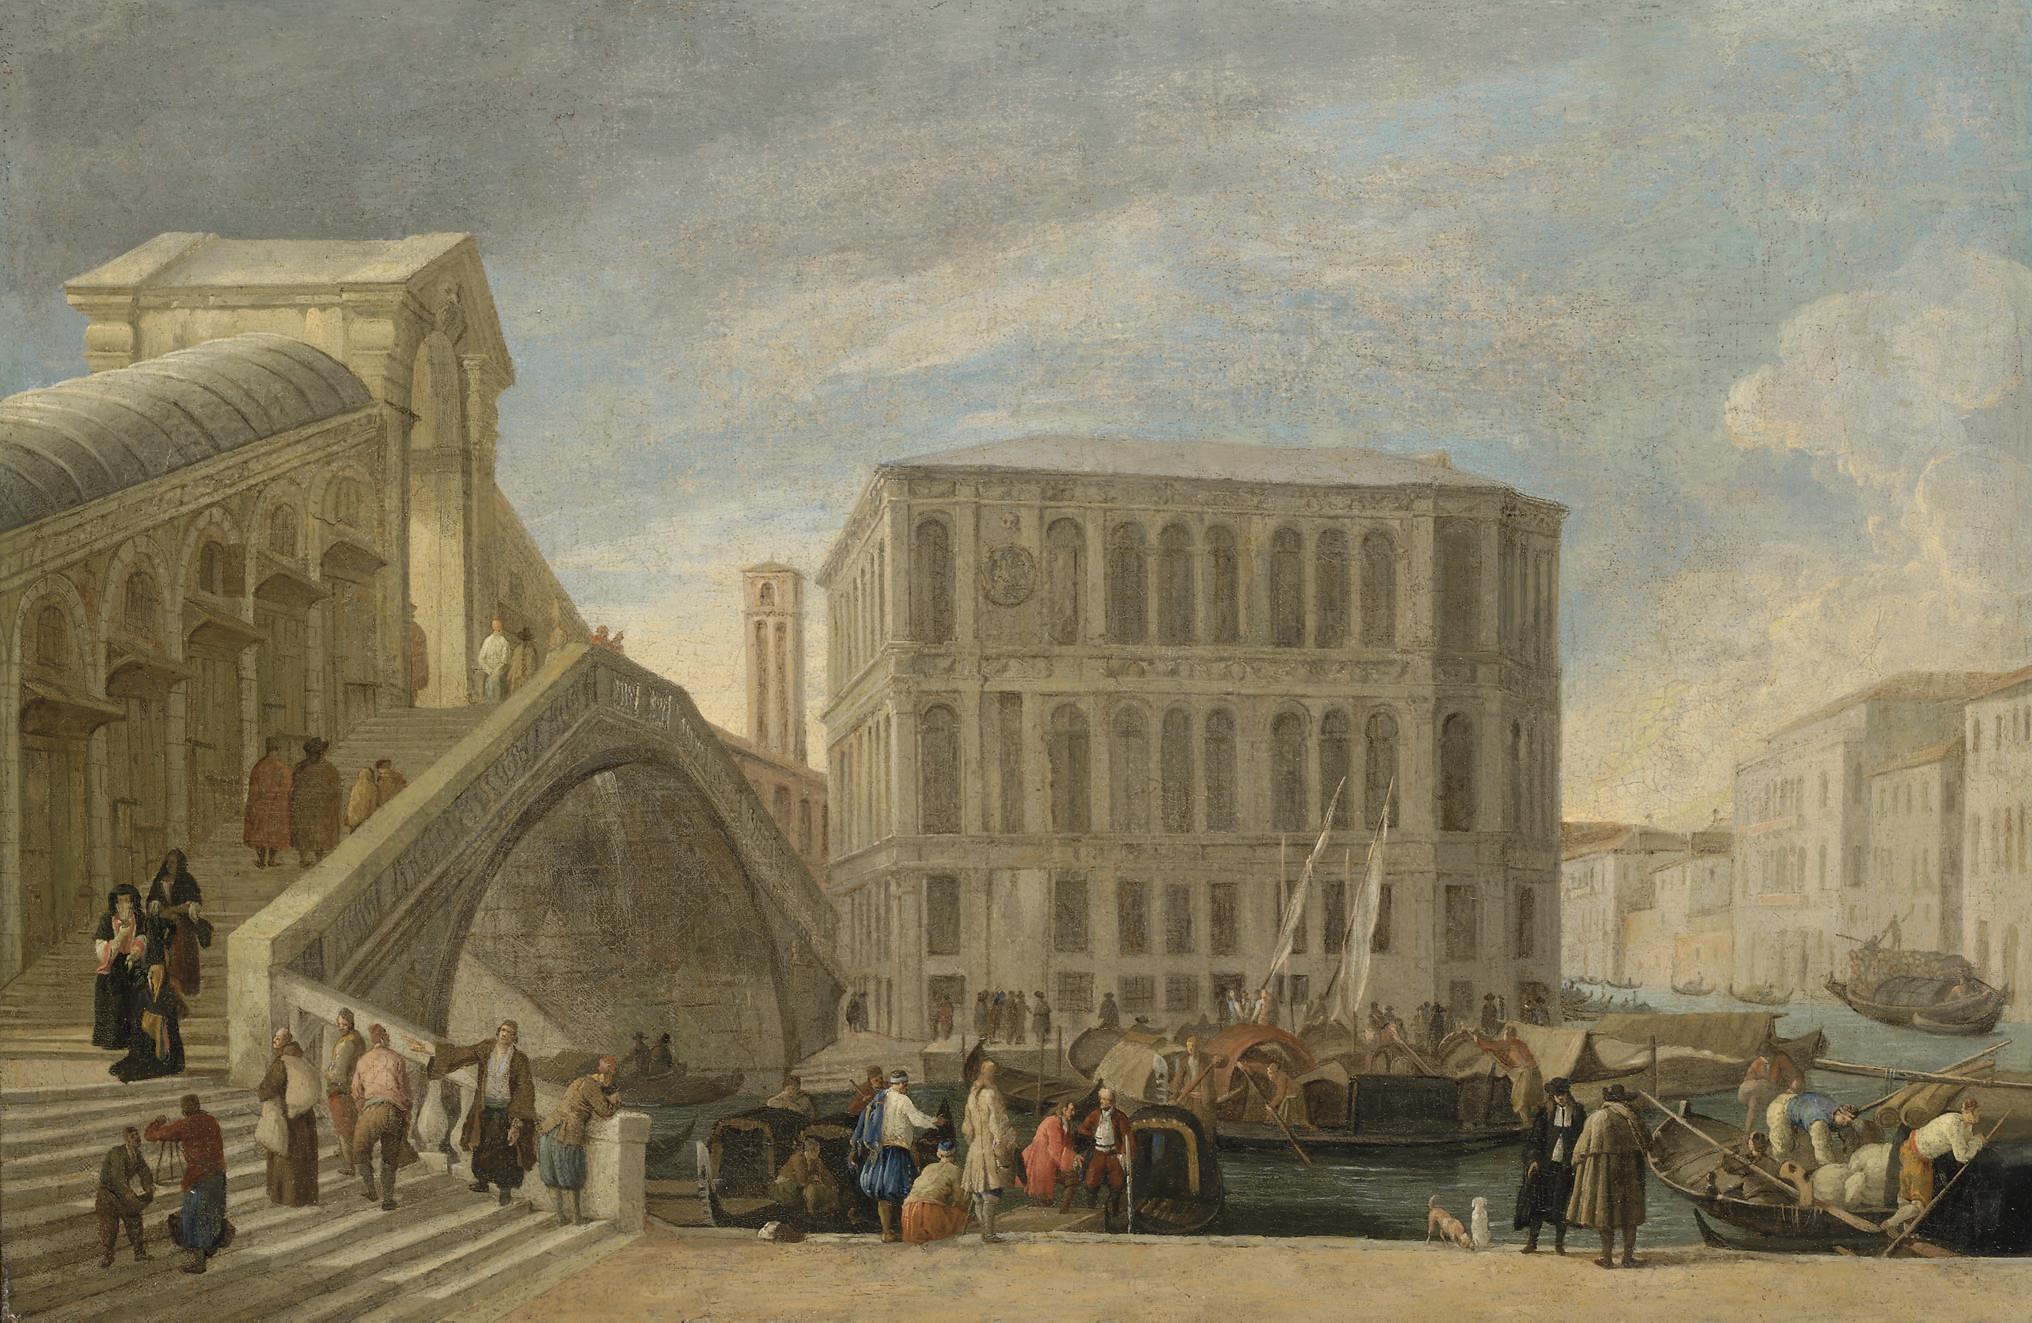 The Rialto Bridge on the Grand Canal, Venice, with the Palazzo dei Camerlenghi